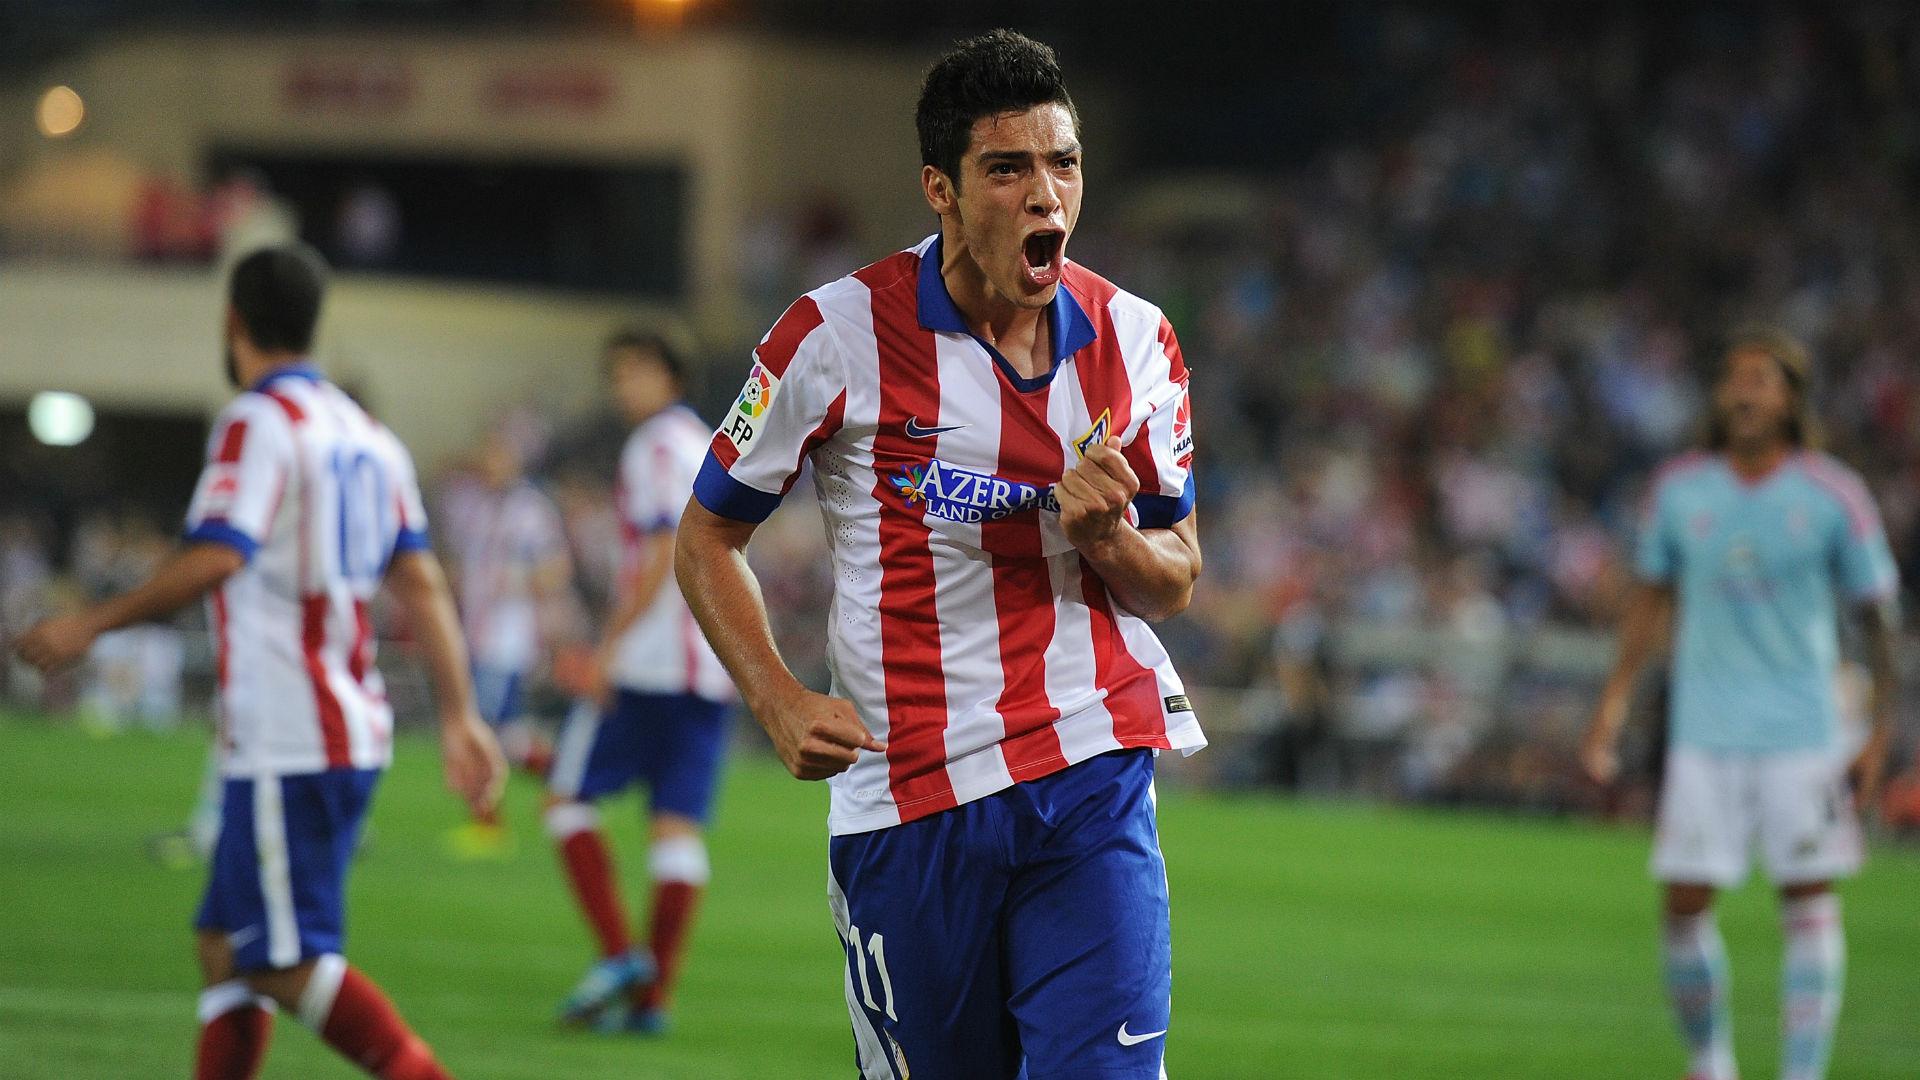 Raúl Alonso Jiménez Atlético de Madrid 2014/2015